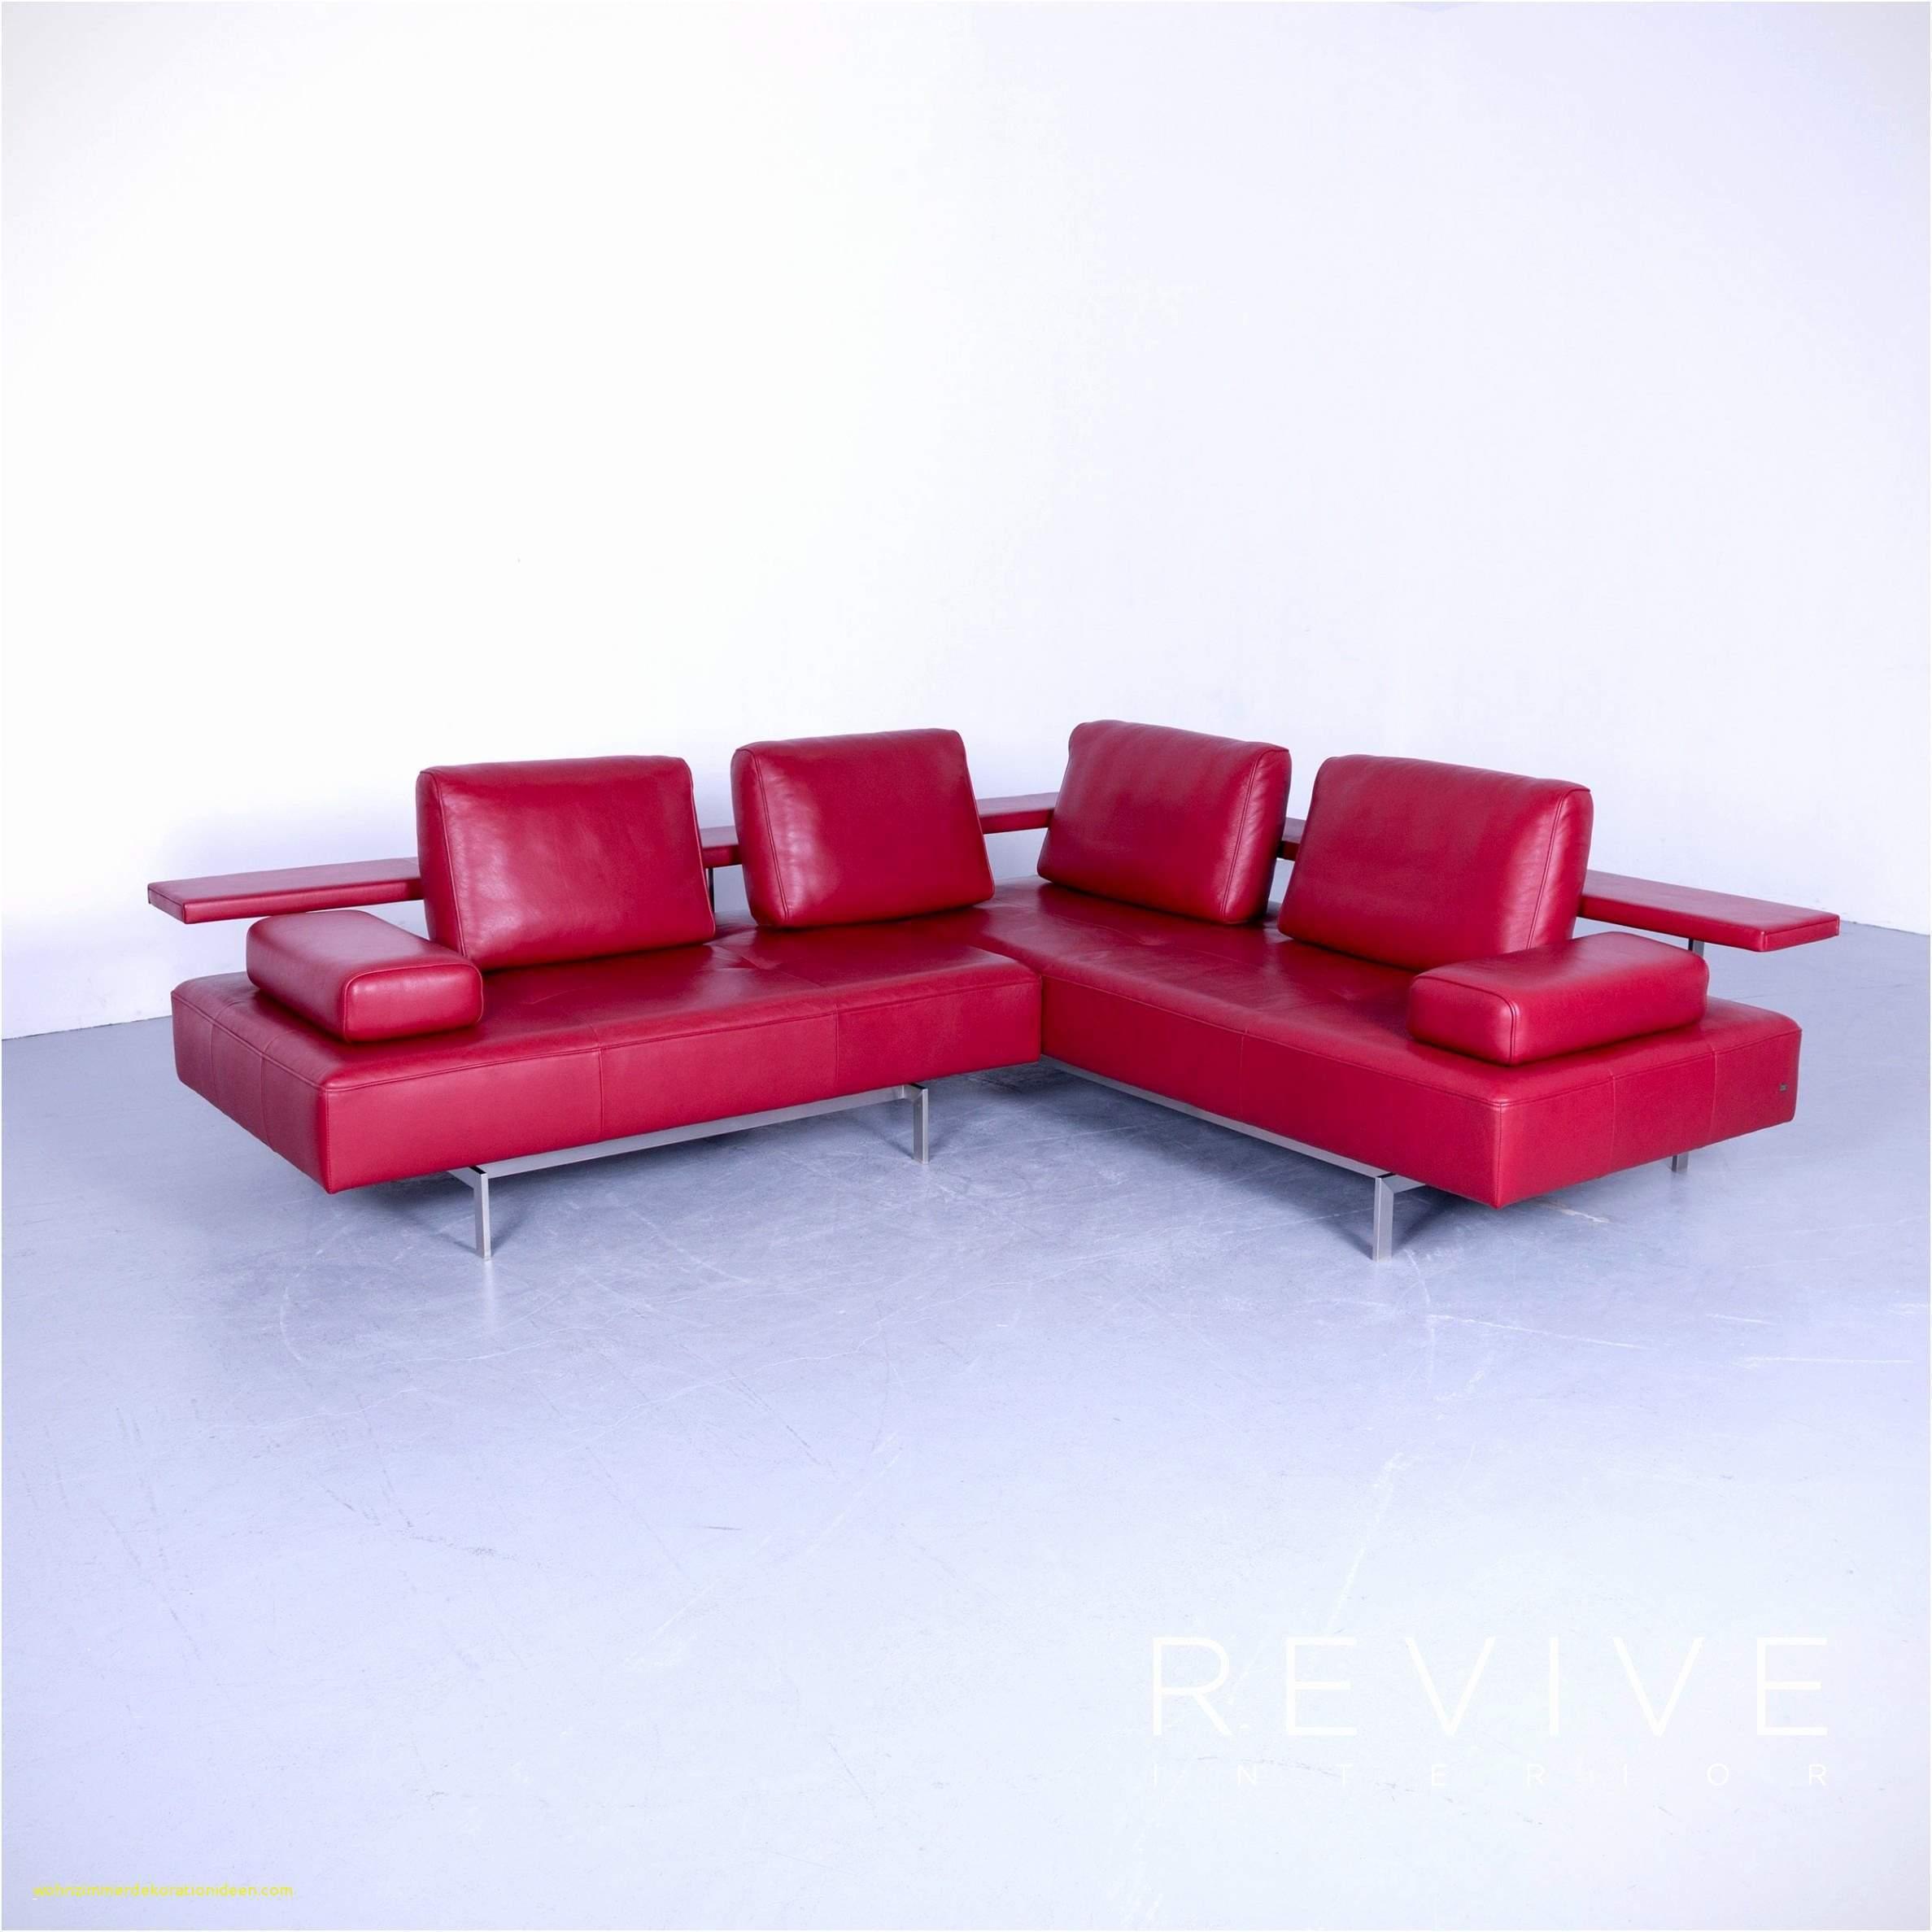 lounge sofa wohnzimmer elegant lounge sofa wohnzimmer reizend 44 schon lounge sofa leder of lounge sofa wohnzimmer